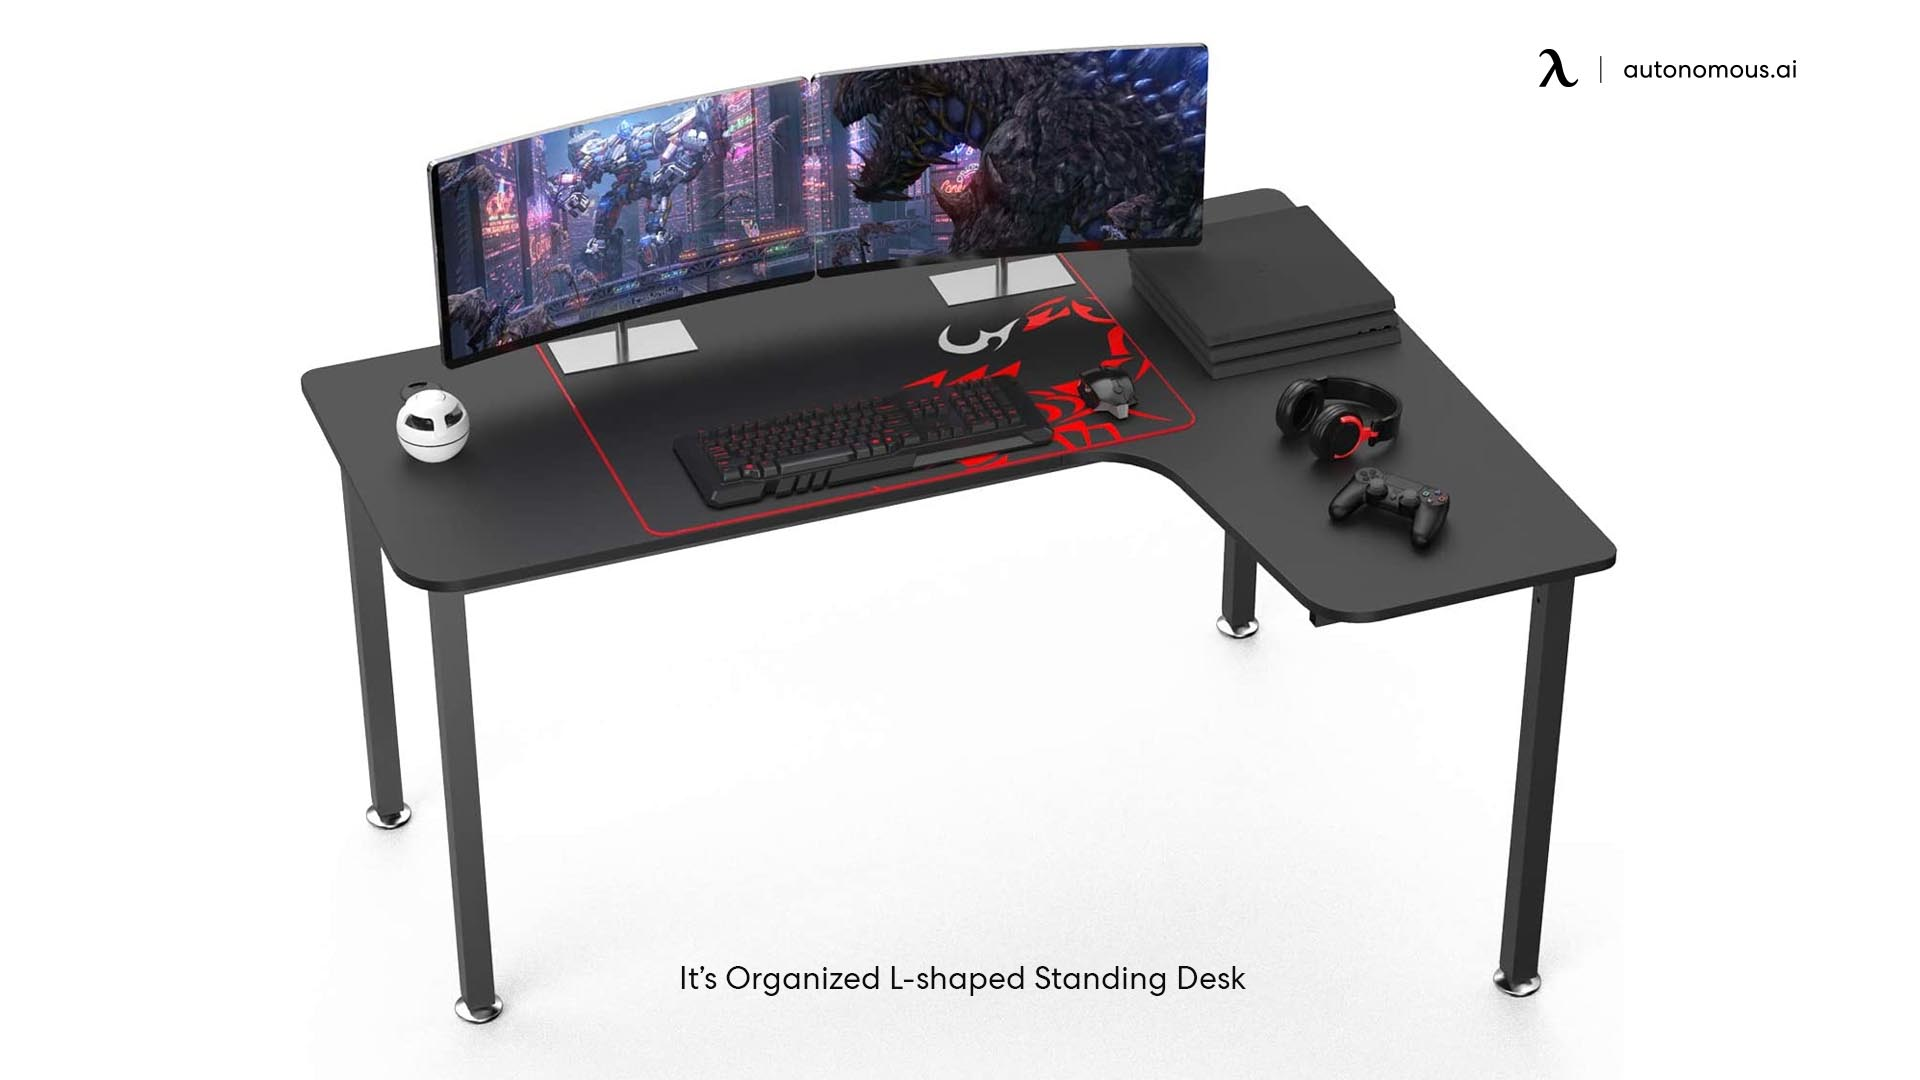 Organized L-shaped Standing Desk